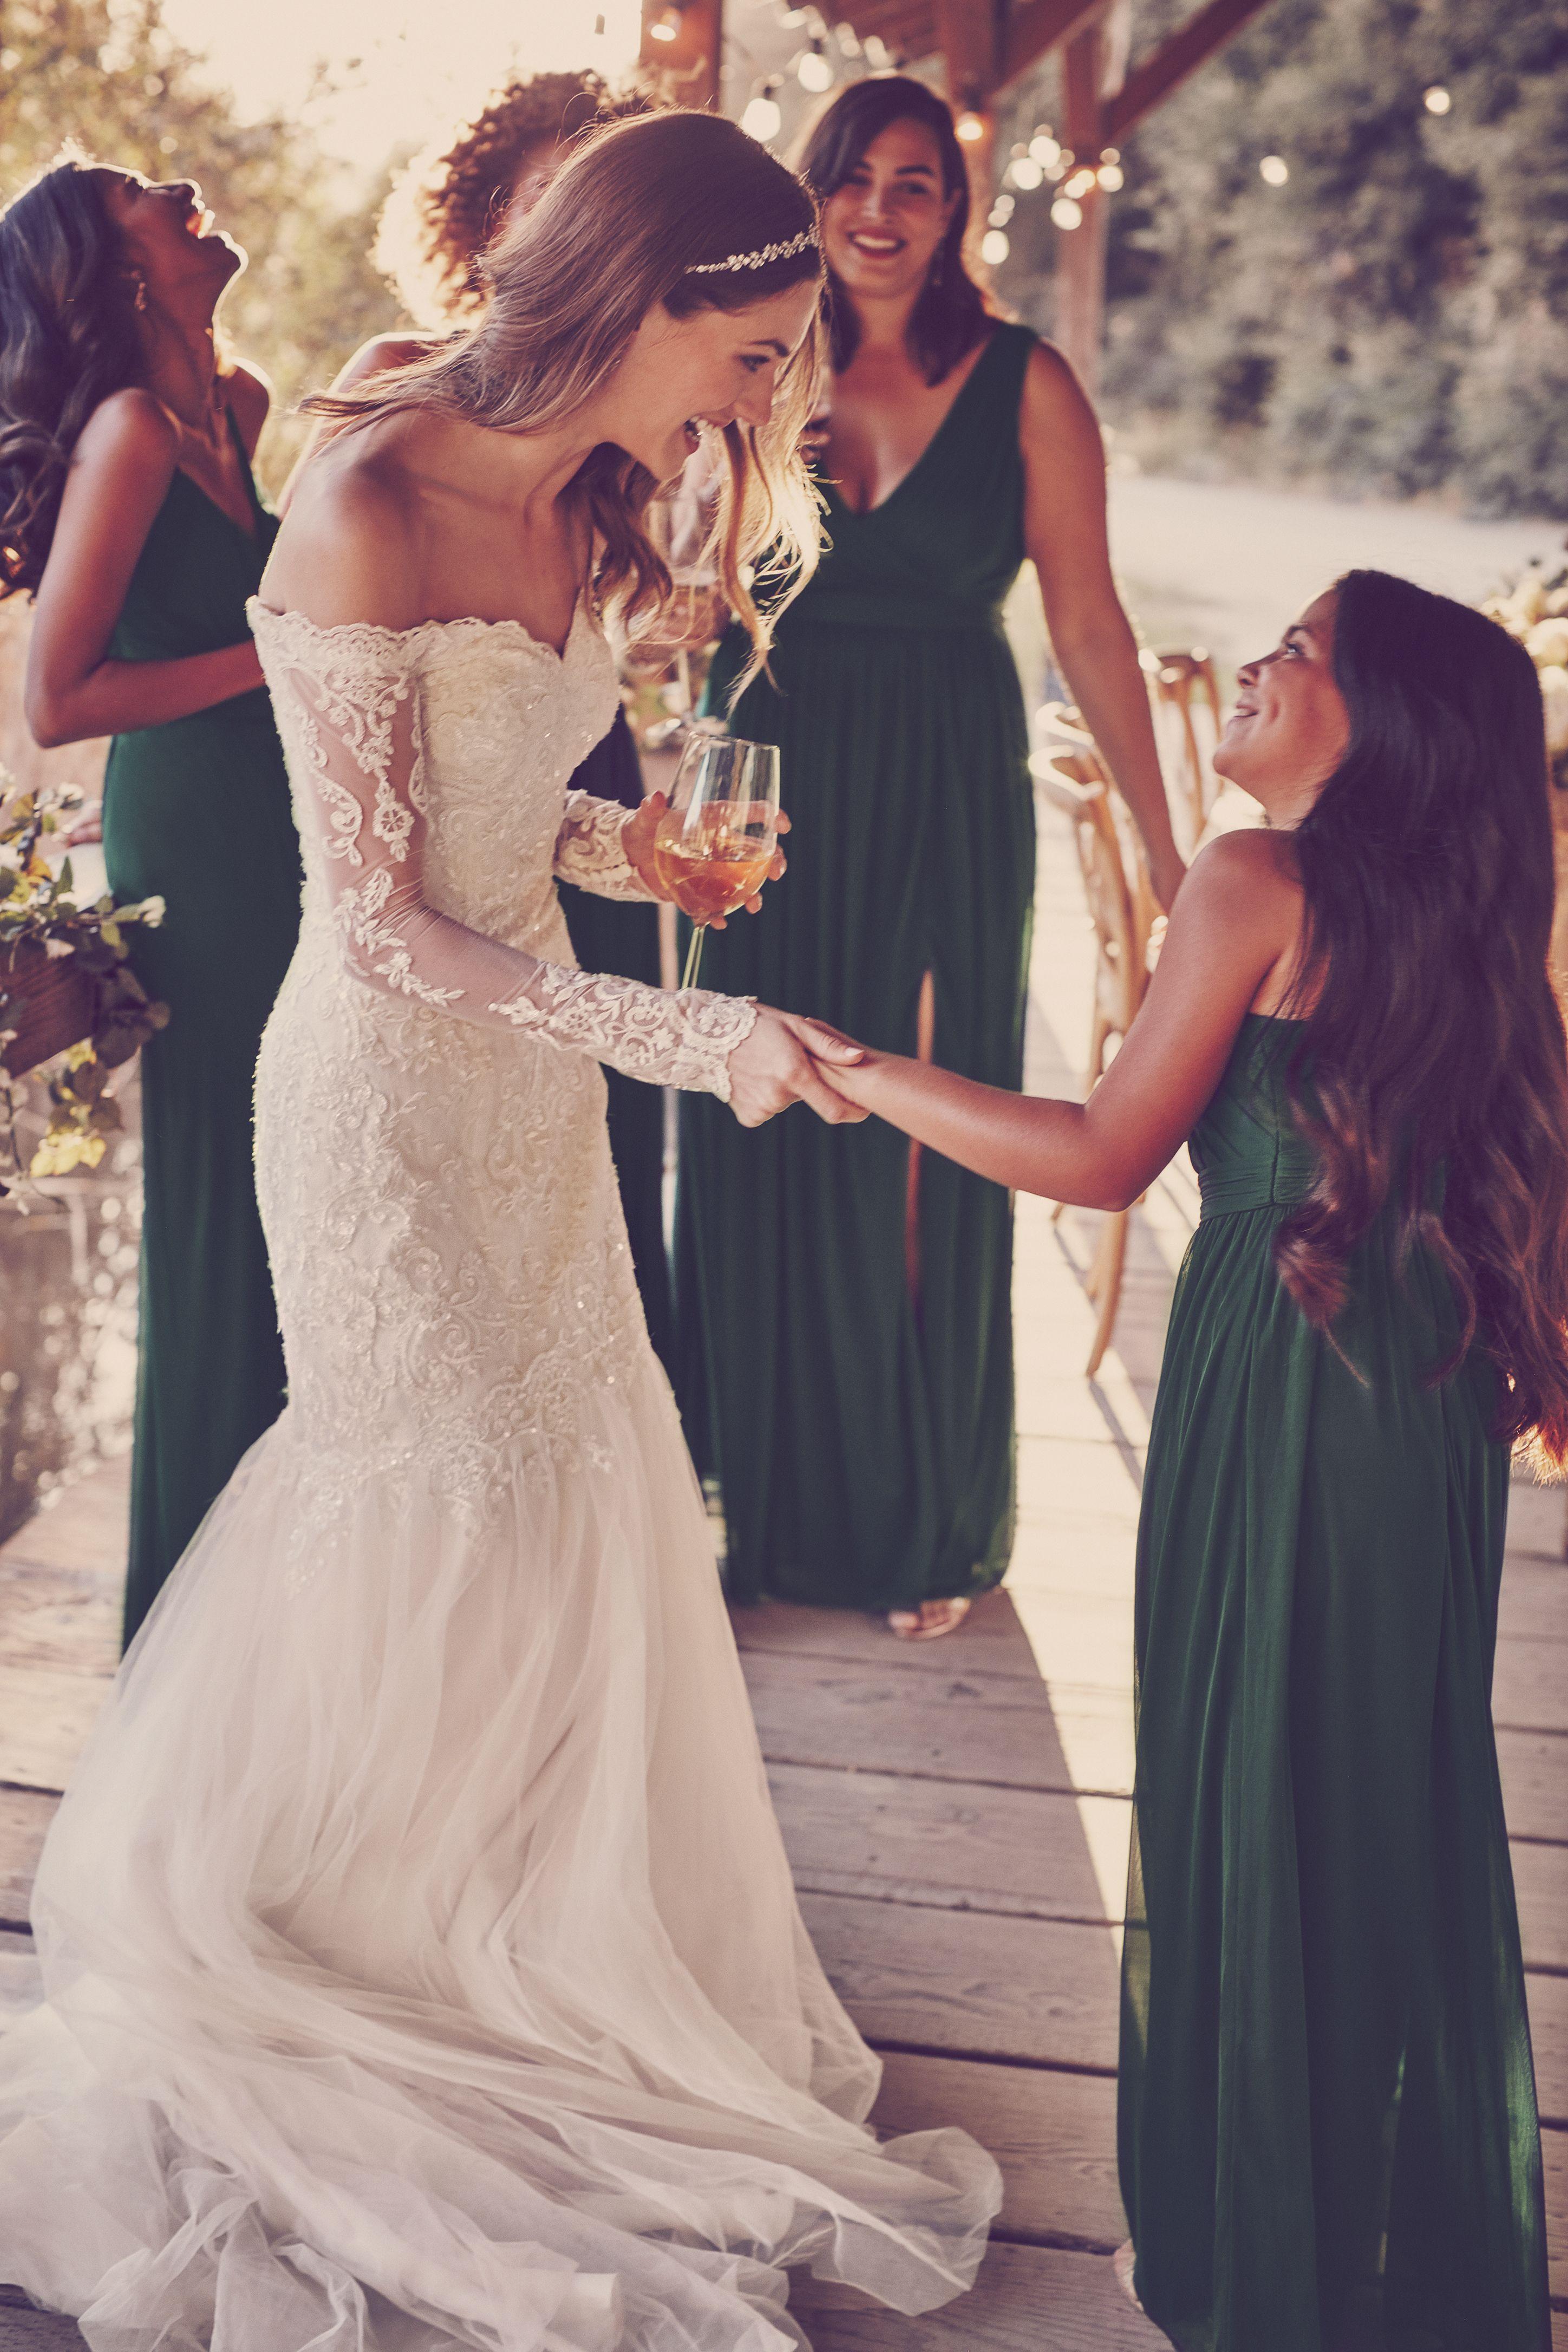 Into The Wild Formal Outdoor Wedding Lookbook David S Bridal Blog Sweetheart Wedding Dress Dream Wedding Dresses Outdoor Wedding Dress